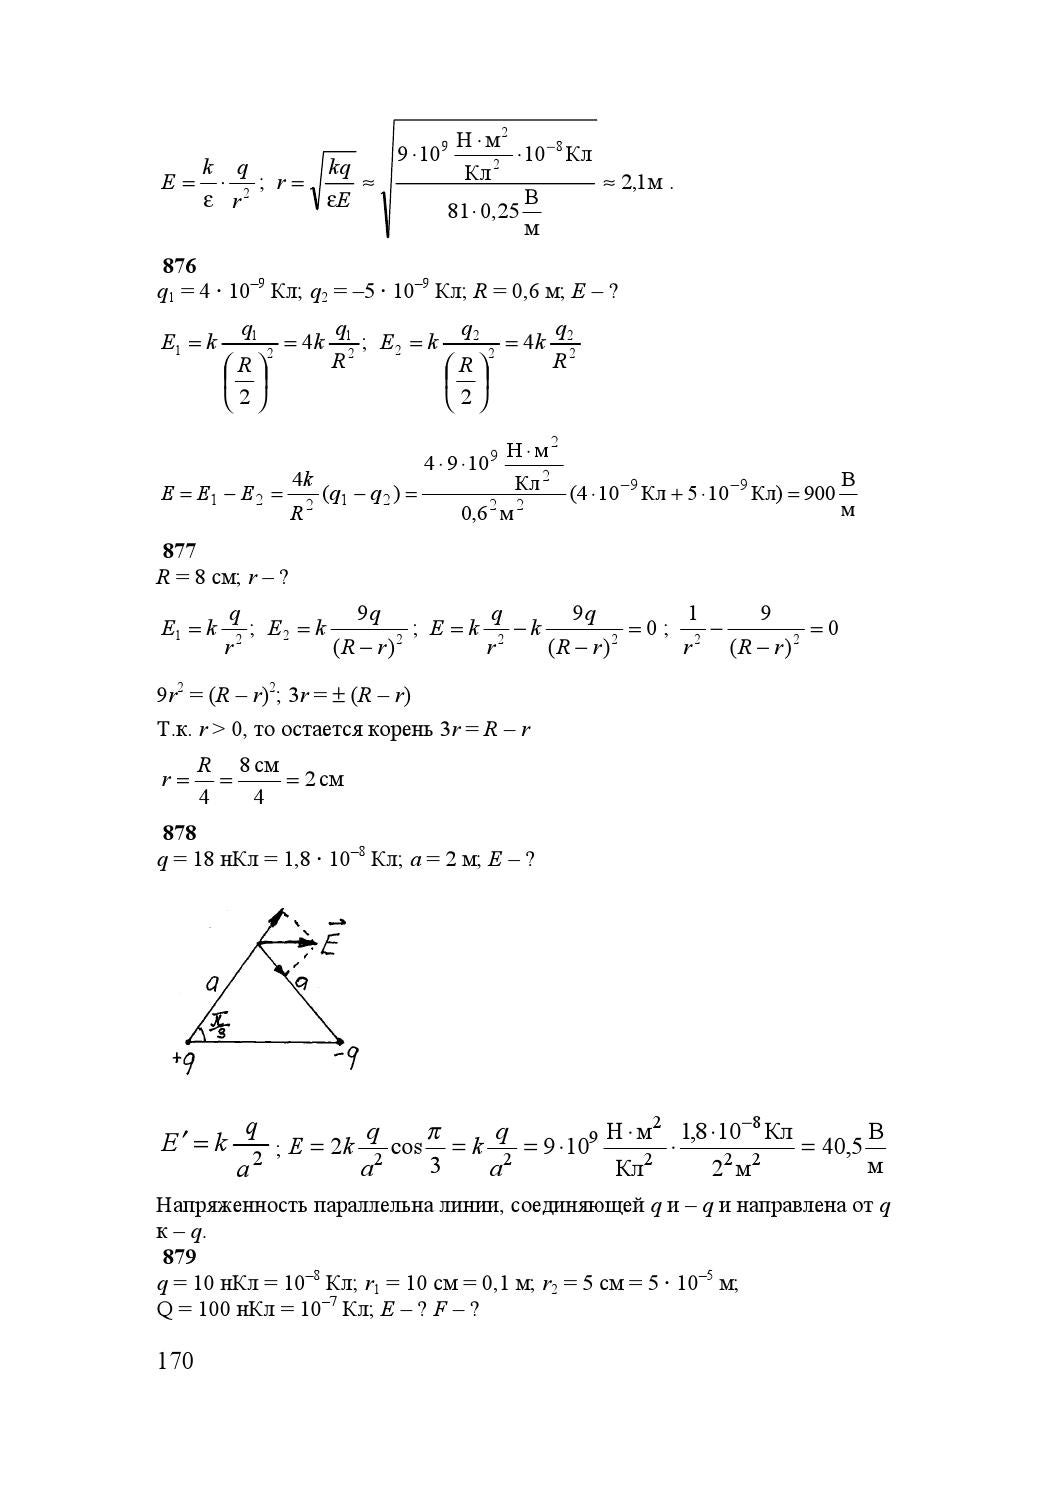 гдз физике степанова 10-11 онлайн